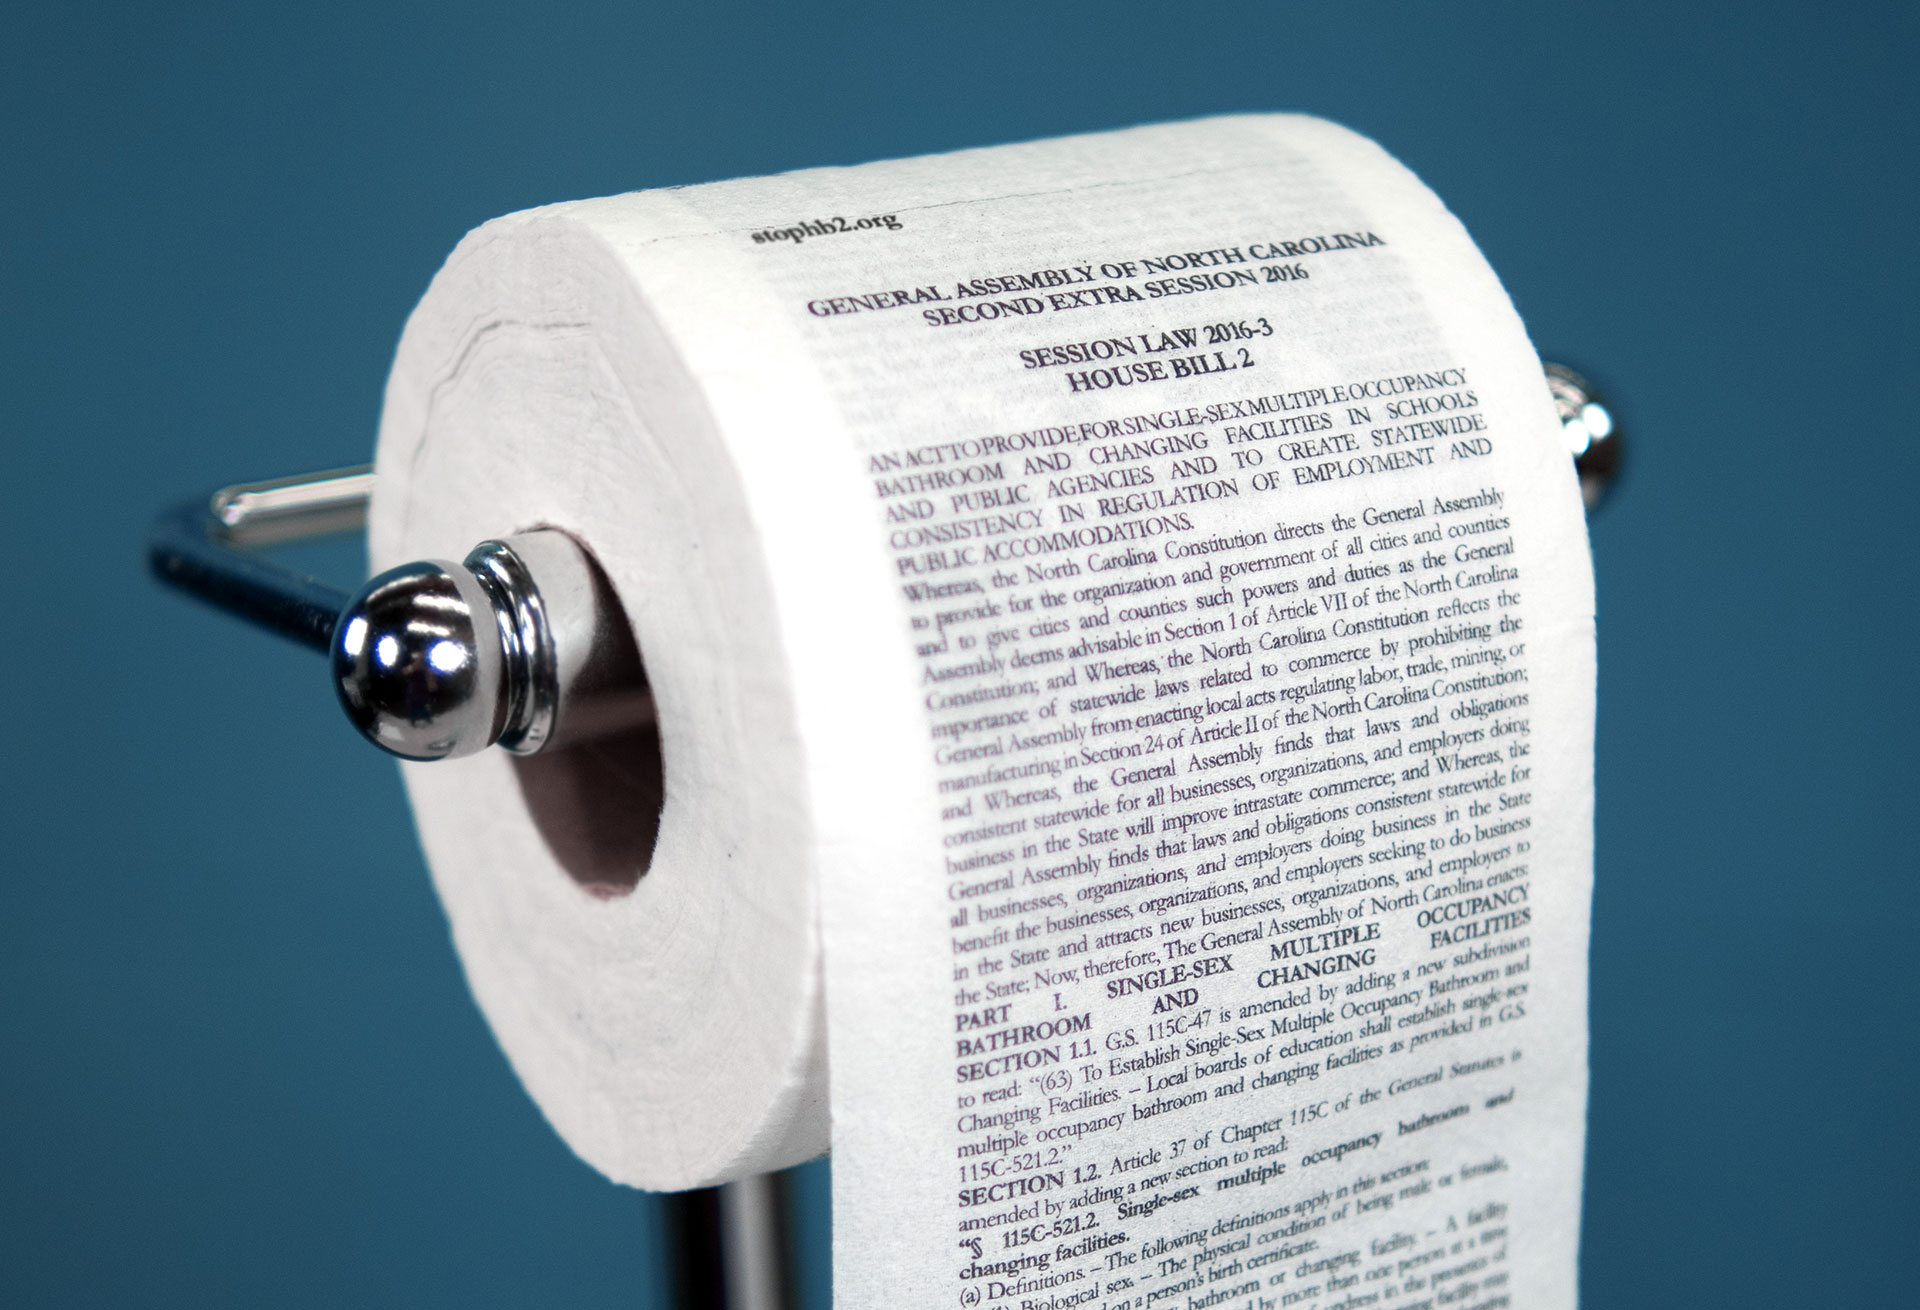 mckinney-toilet-paper-hed-2016.jpg